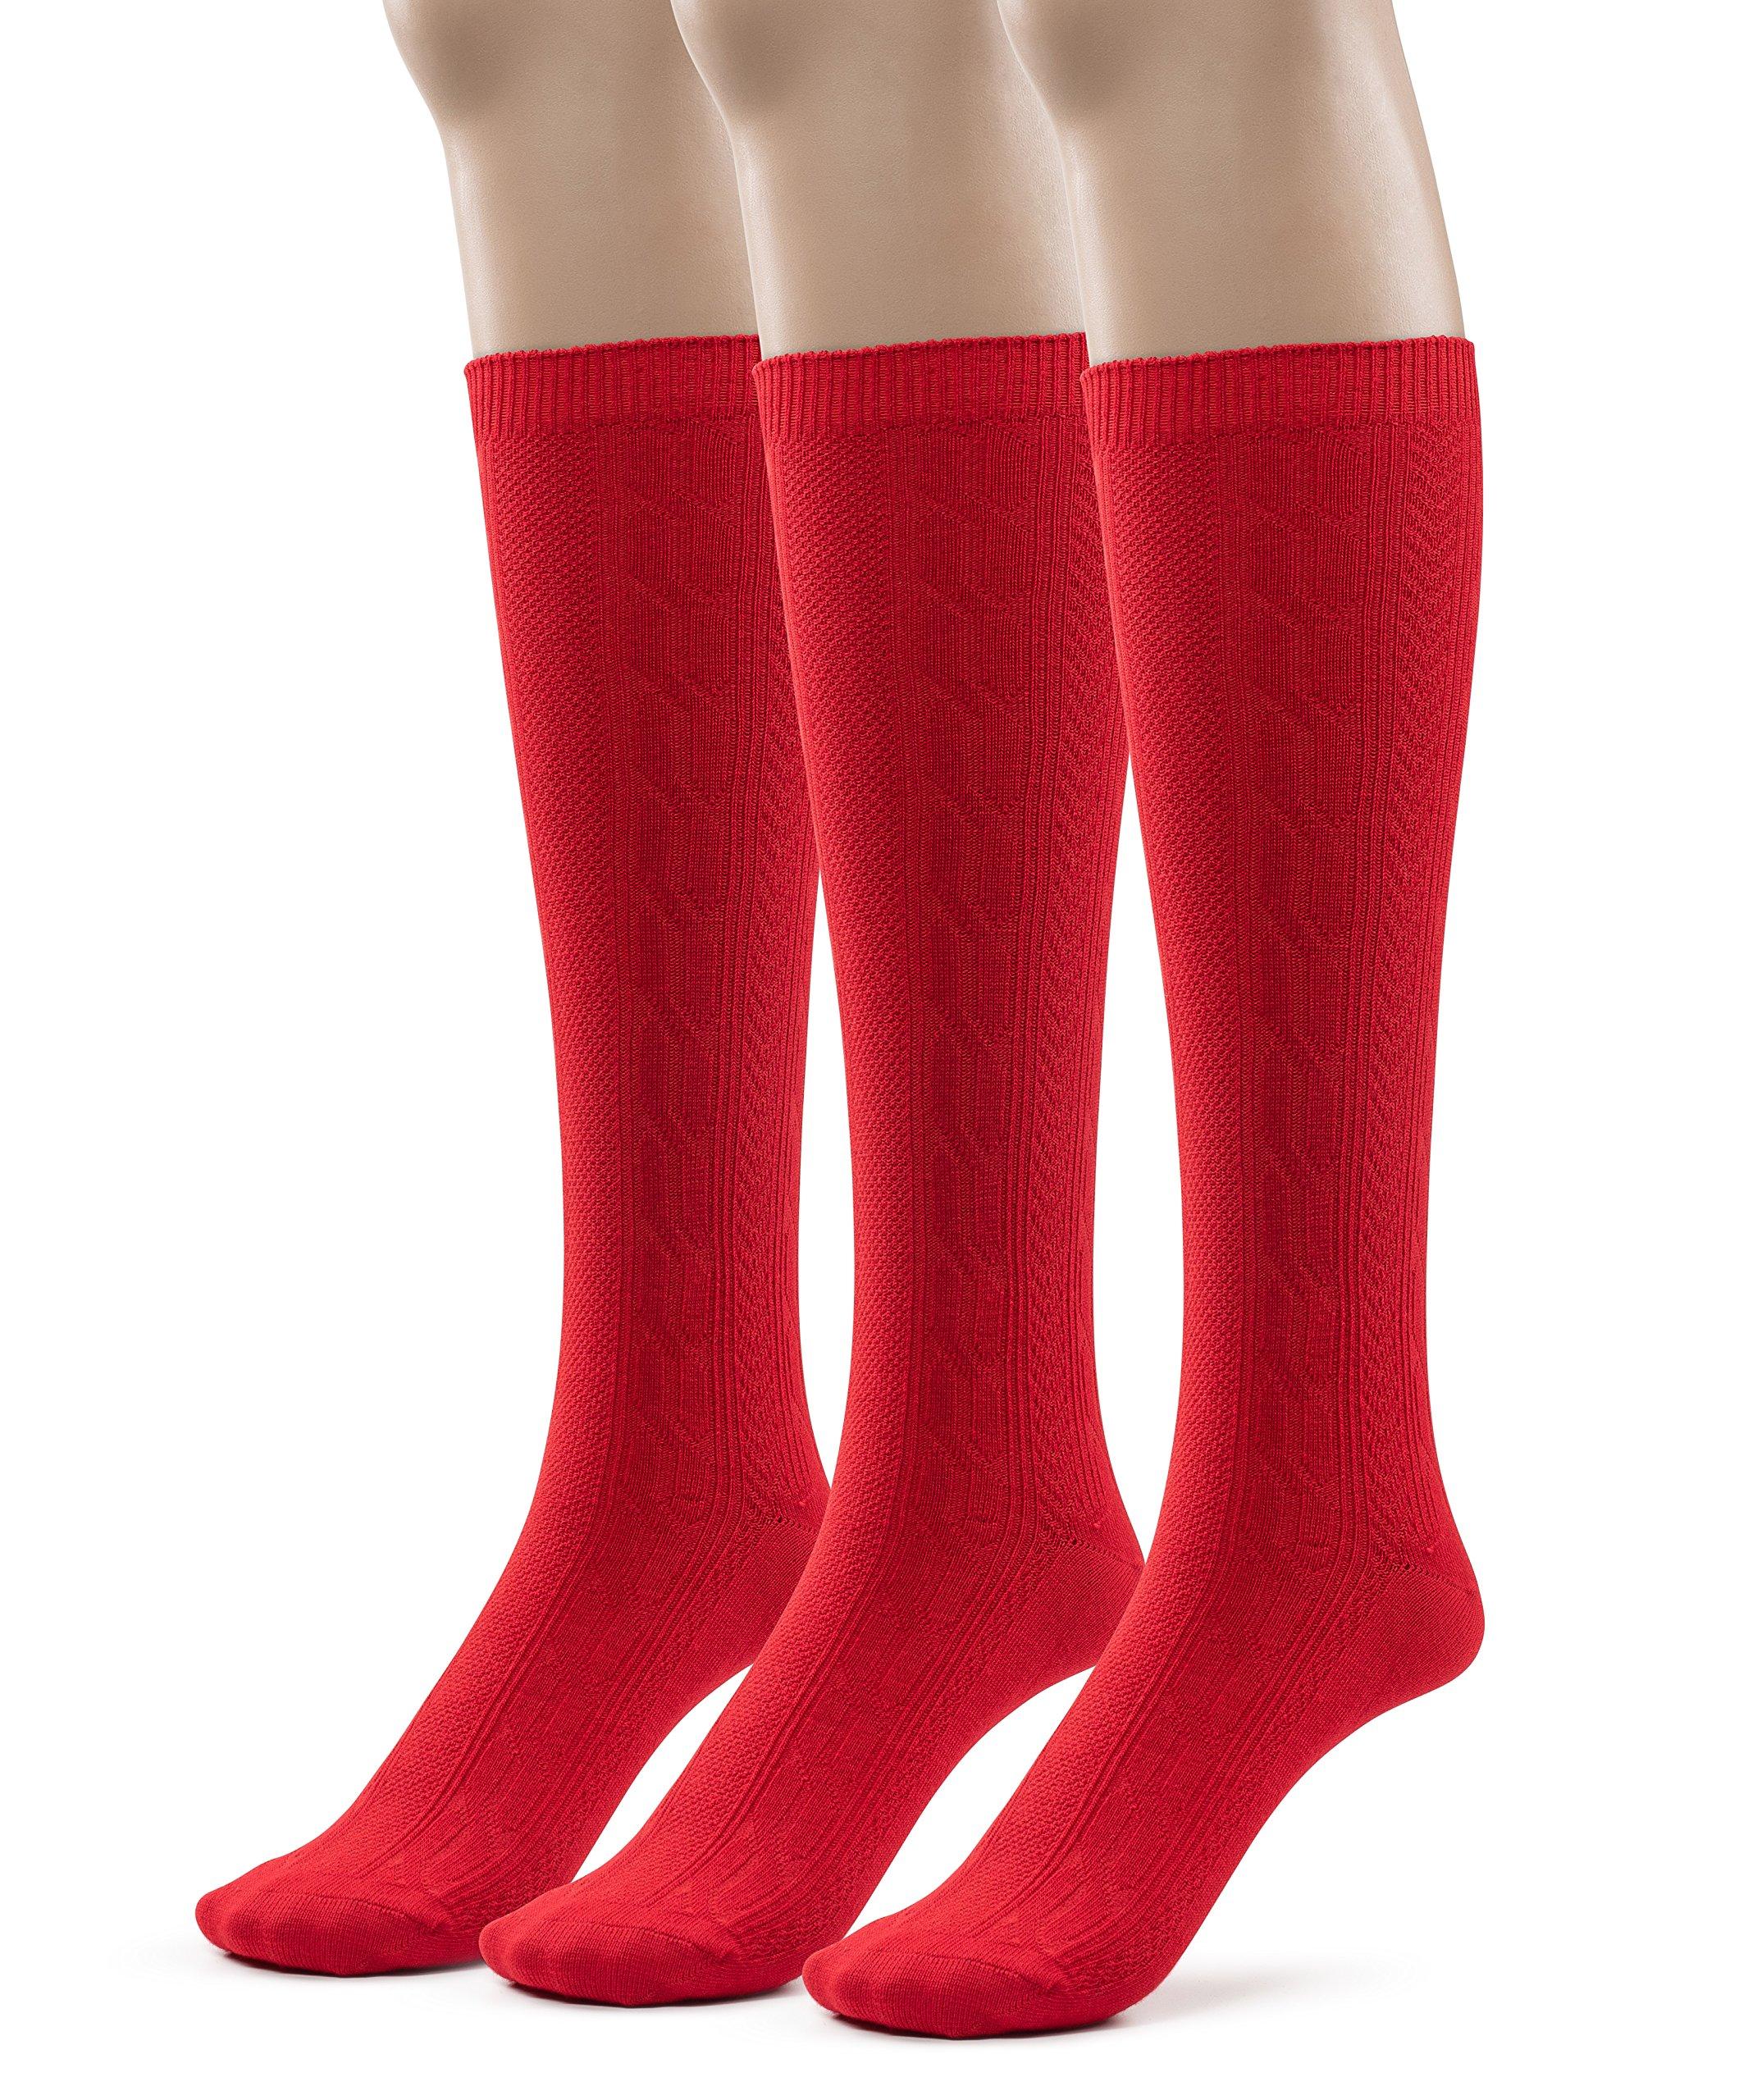 Girls Bamboo Casual Knee High Socks, School Uniform Colors (Medium (8-9), Red)